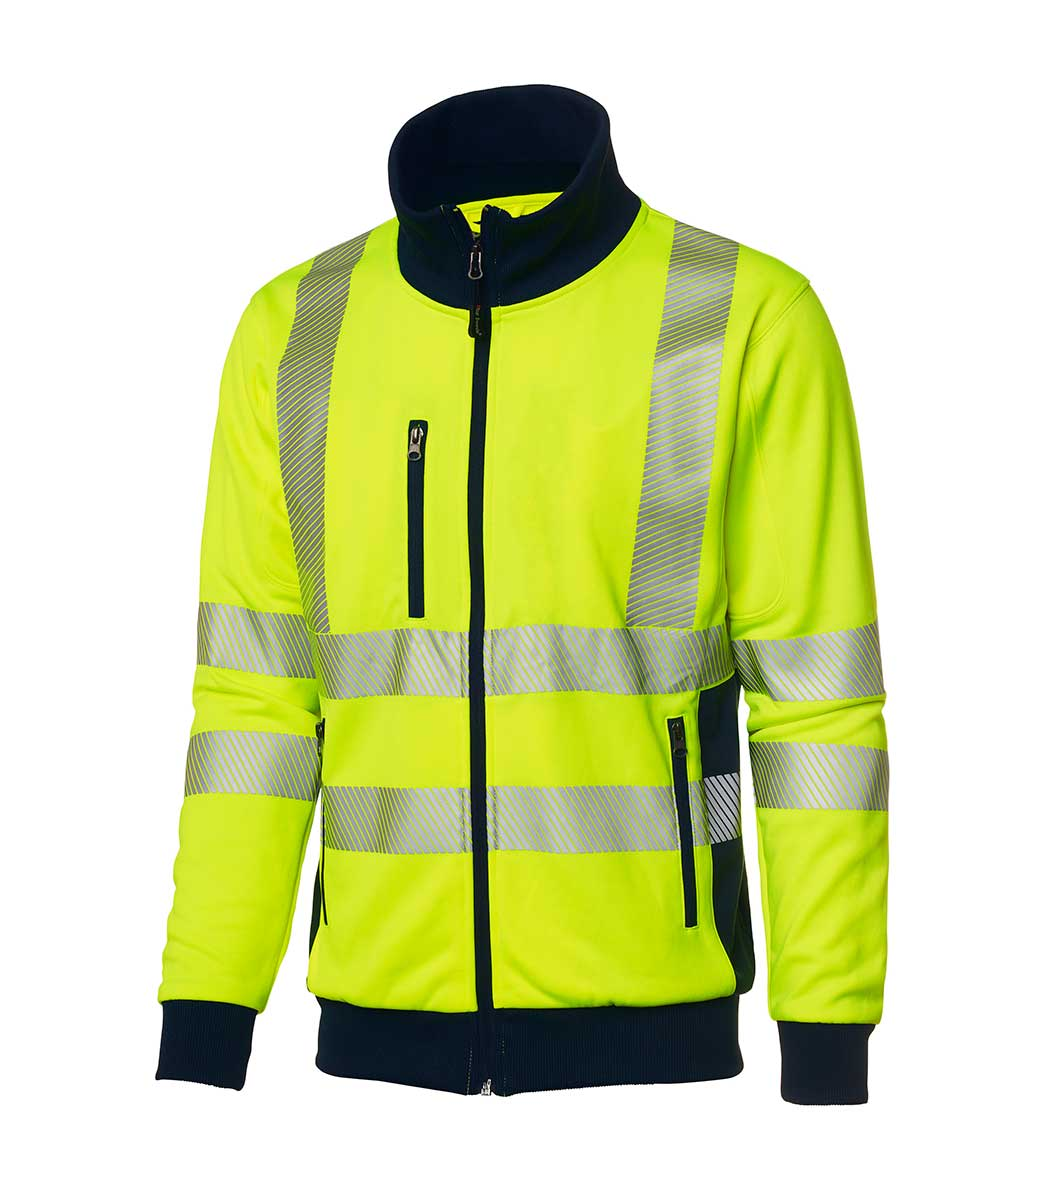 4395bc60 Gul jakke med 3M refleksbånd ~ Ezzenza.no Arbeidsklær